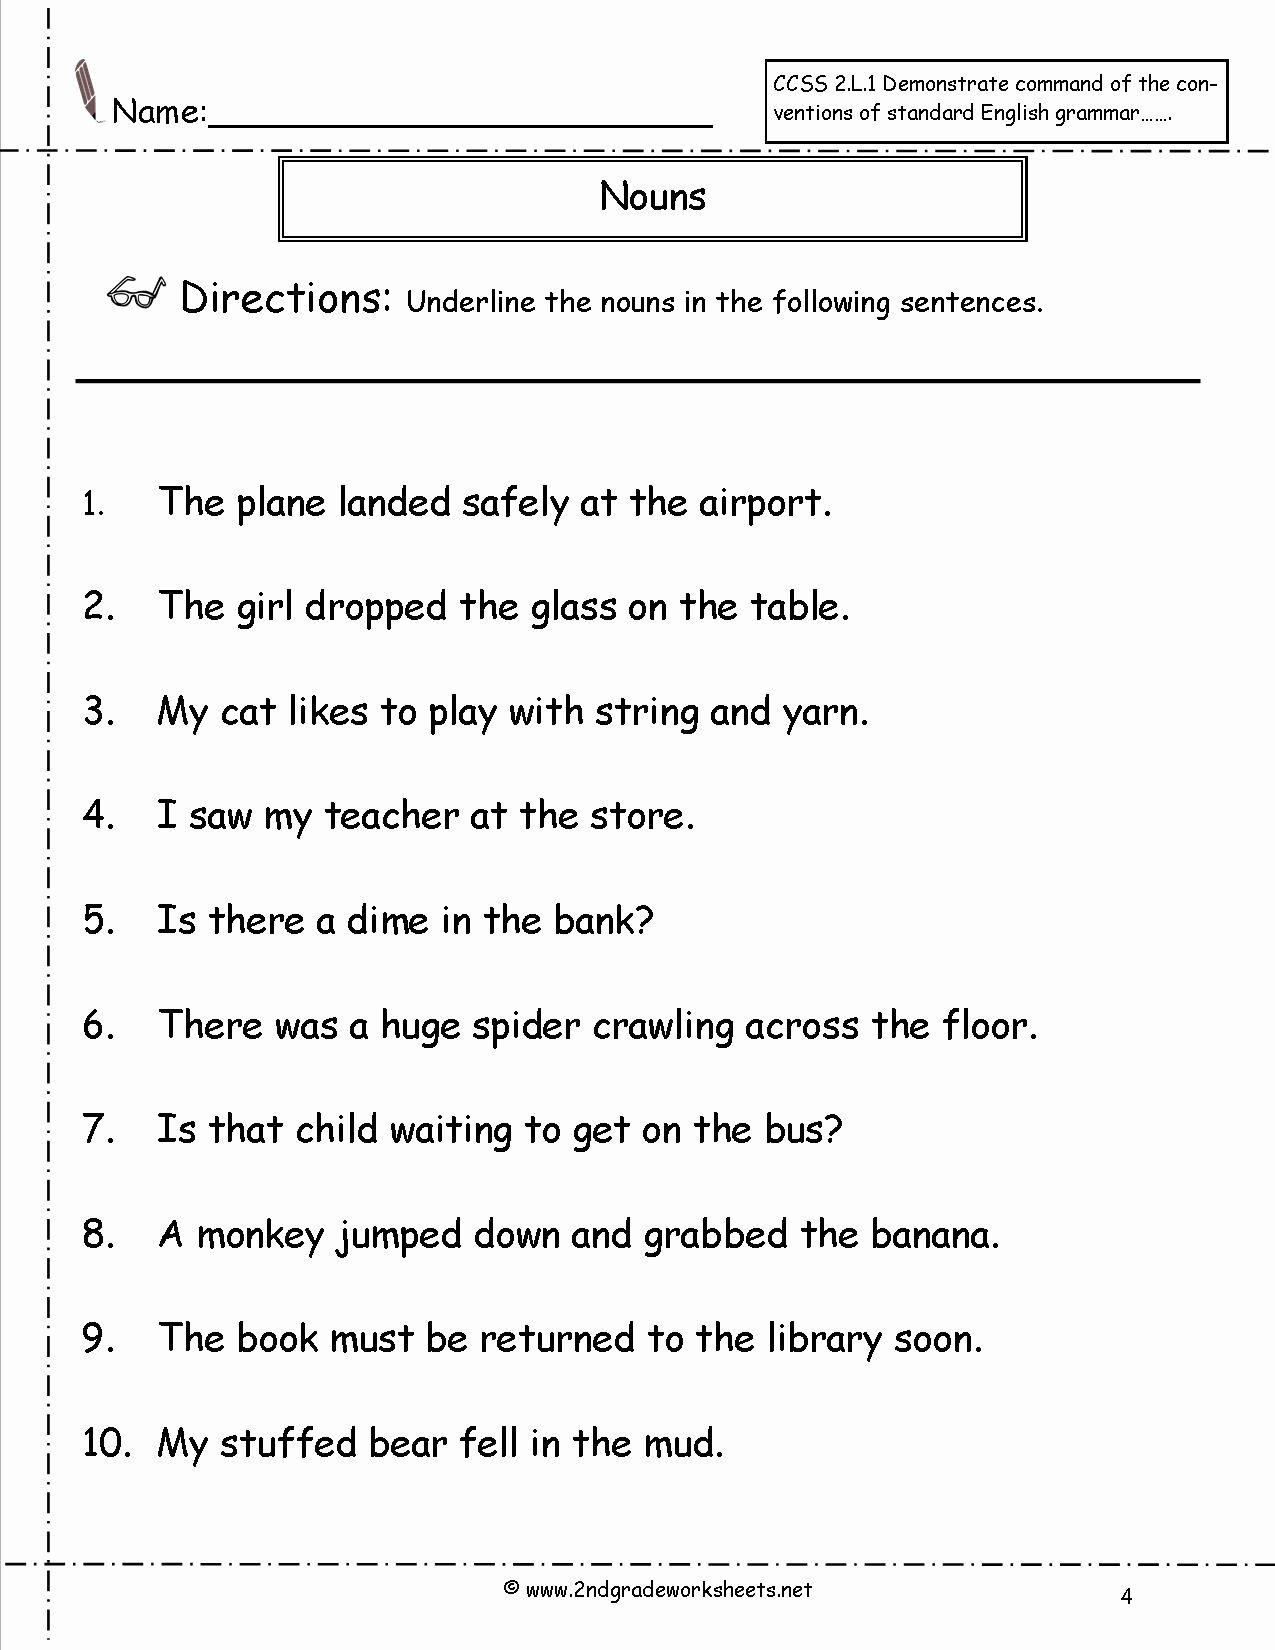 Pronoun Worksheets for 2nd Grade Printable Pronoun Worksheets Free Elementary